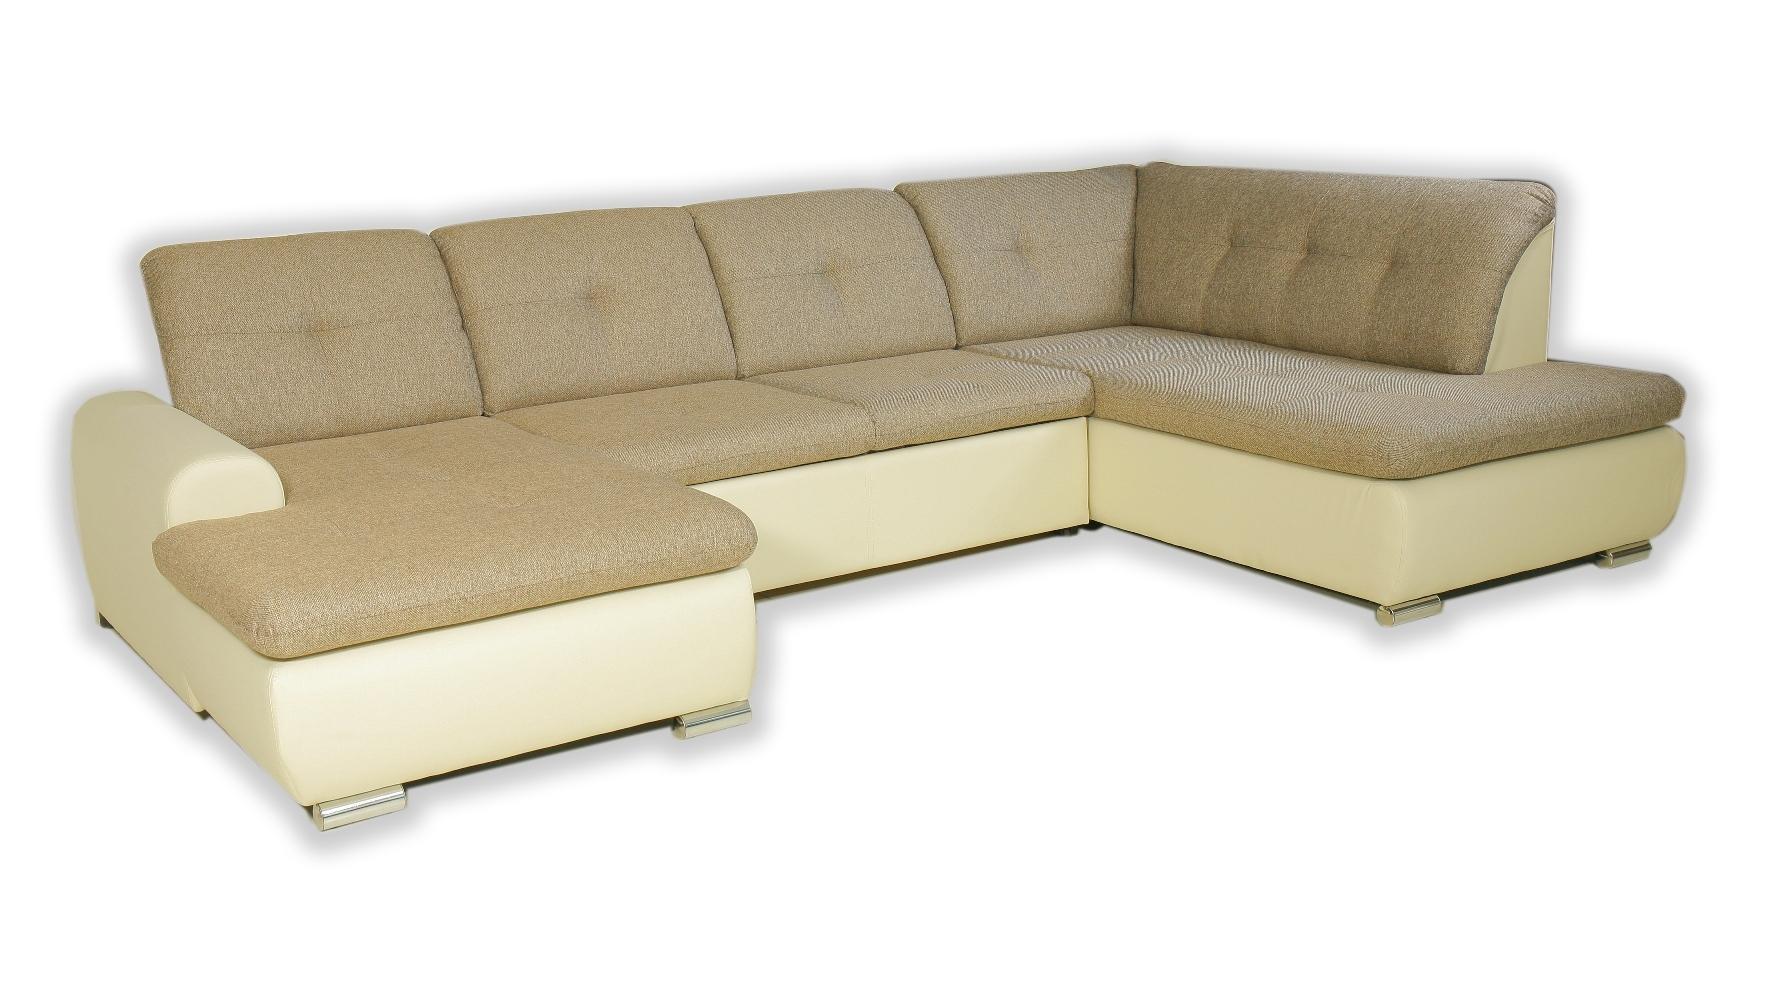 Угловой модульный диван Кристофер модульный угловой шкаф виго